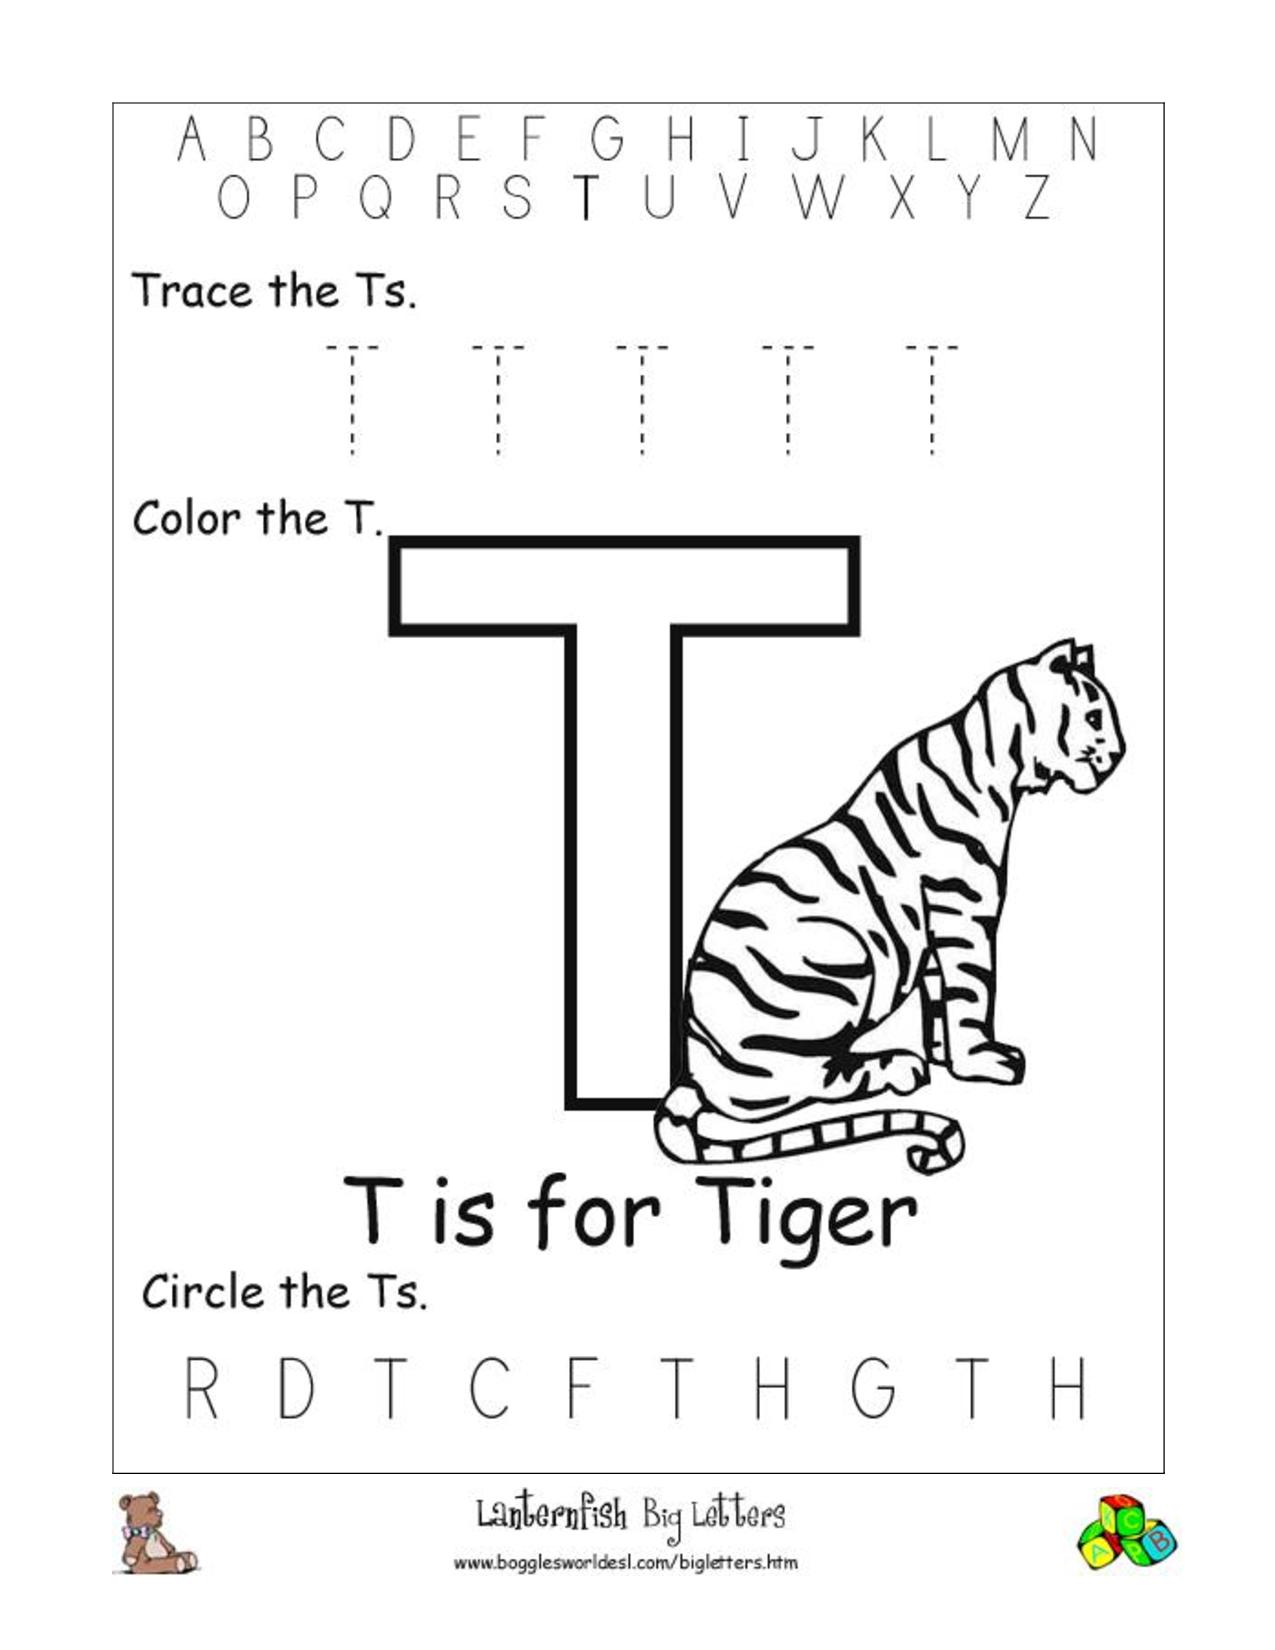 Kindergarten Worksheets For The Letter T 1371665